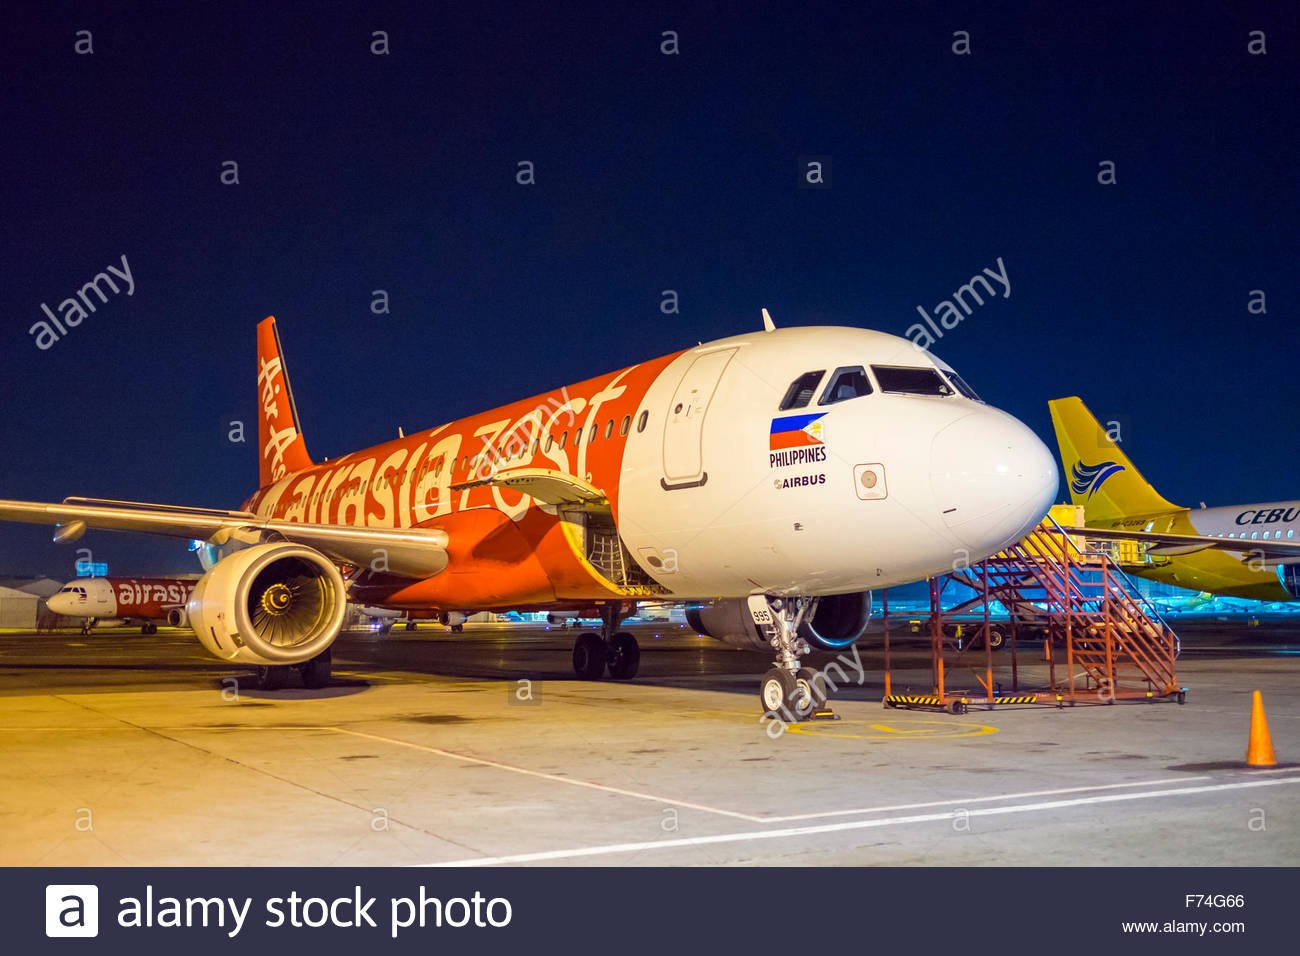 Planes at Ninoy Aquino International Airport at night, Manila International Airport, Pasay, Metro Manila, Philippines - Stock Image